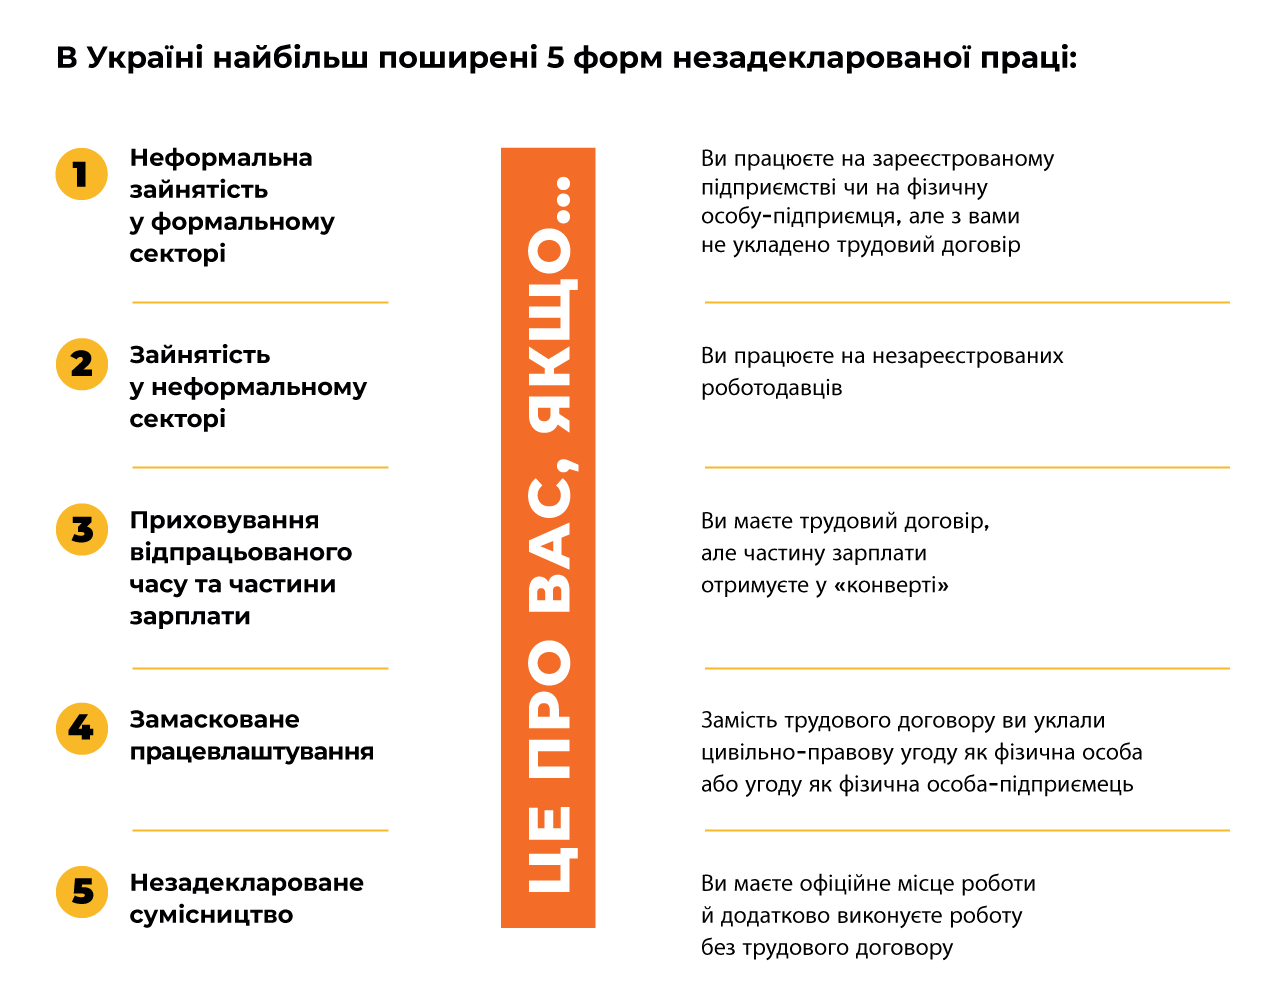 ilo_infographic1_1_ukr-e1579623588986